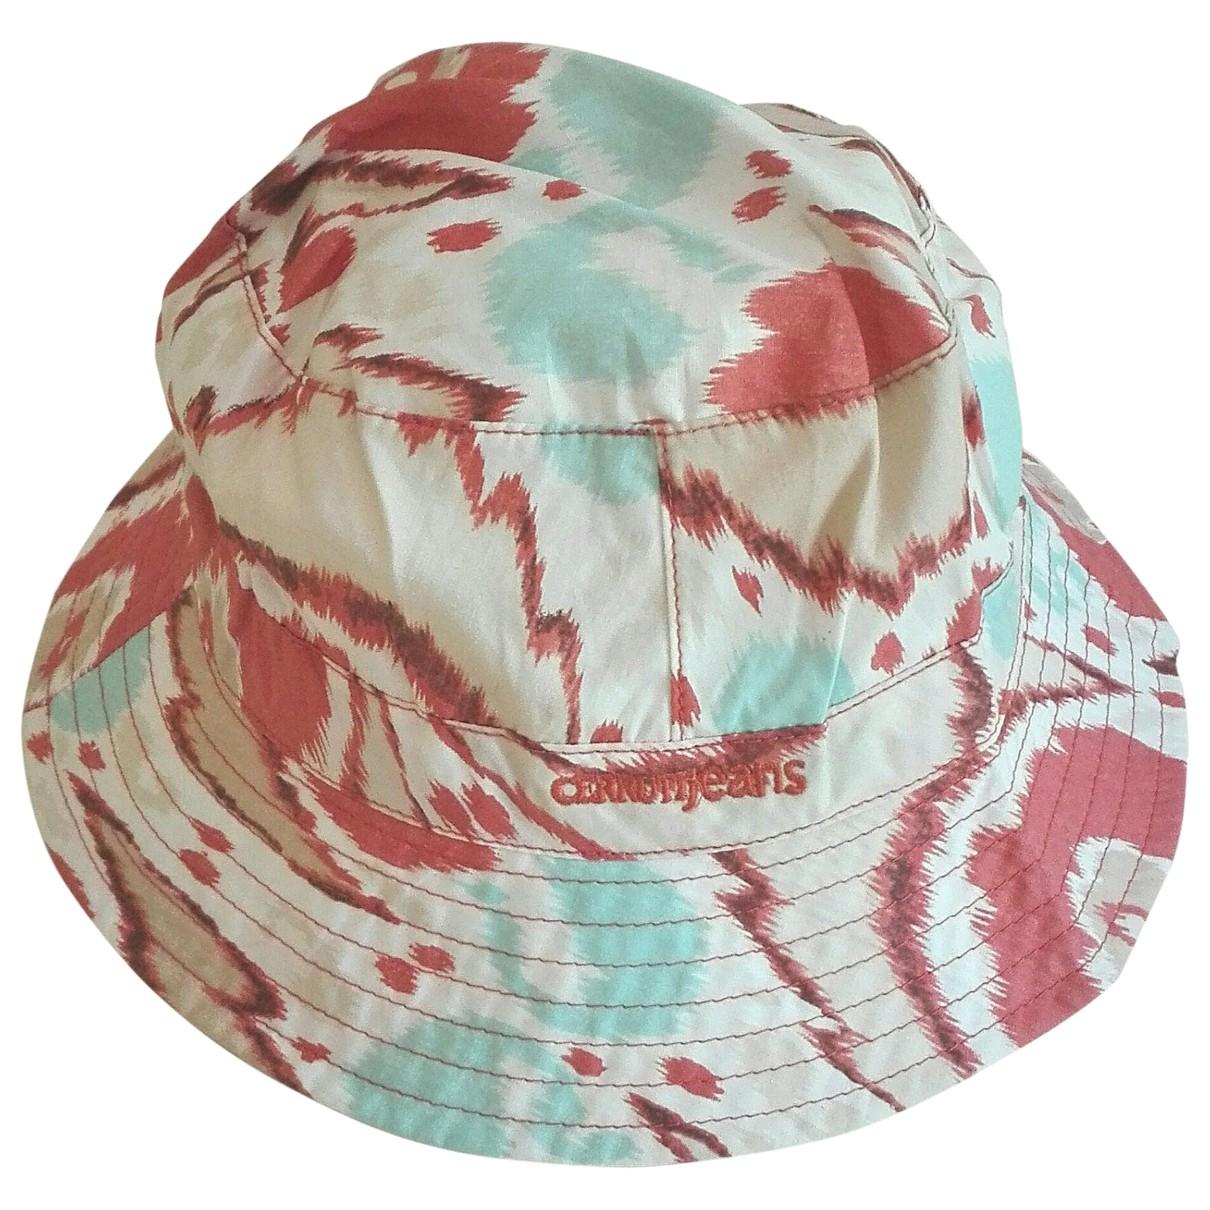 Cerruti \N Cotton hat for Women M International